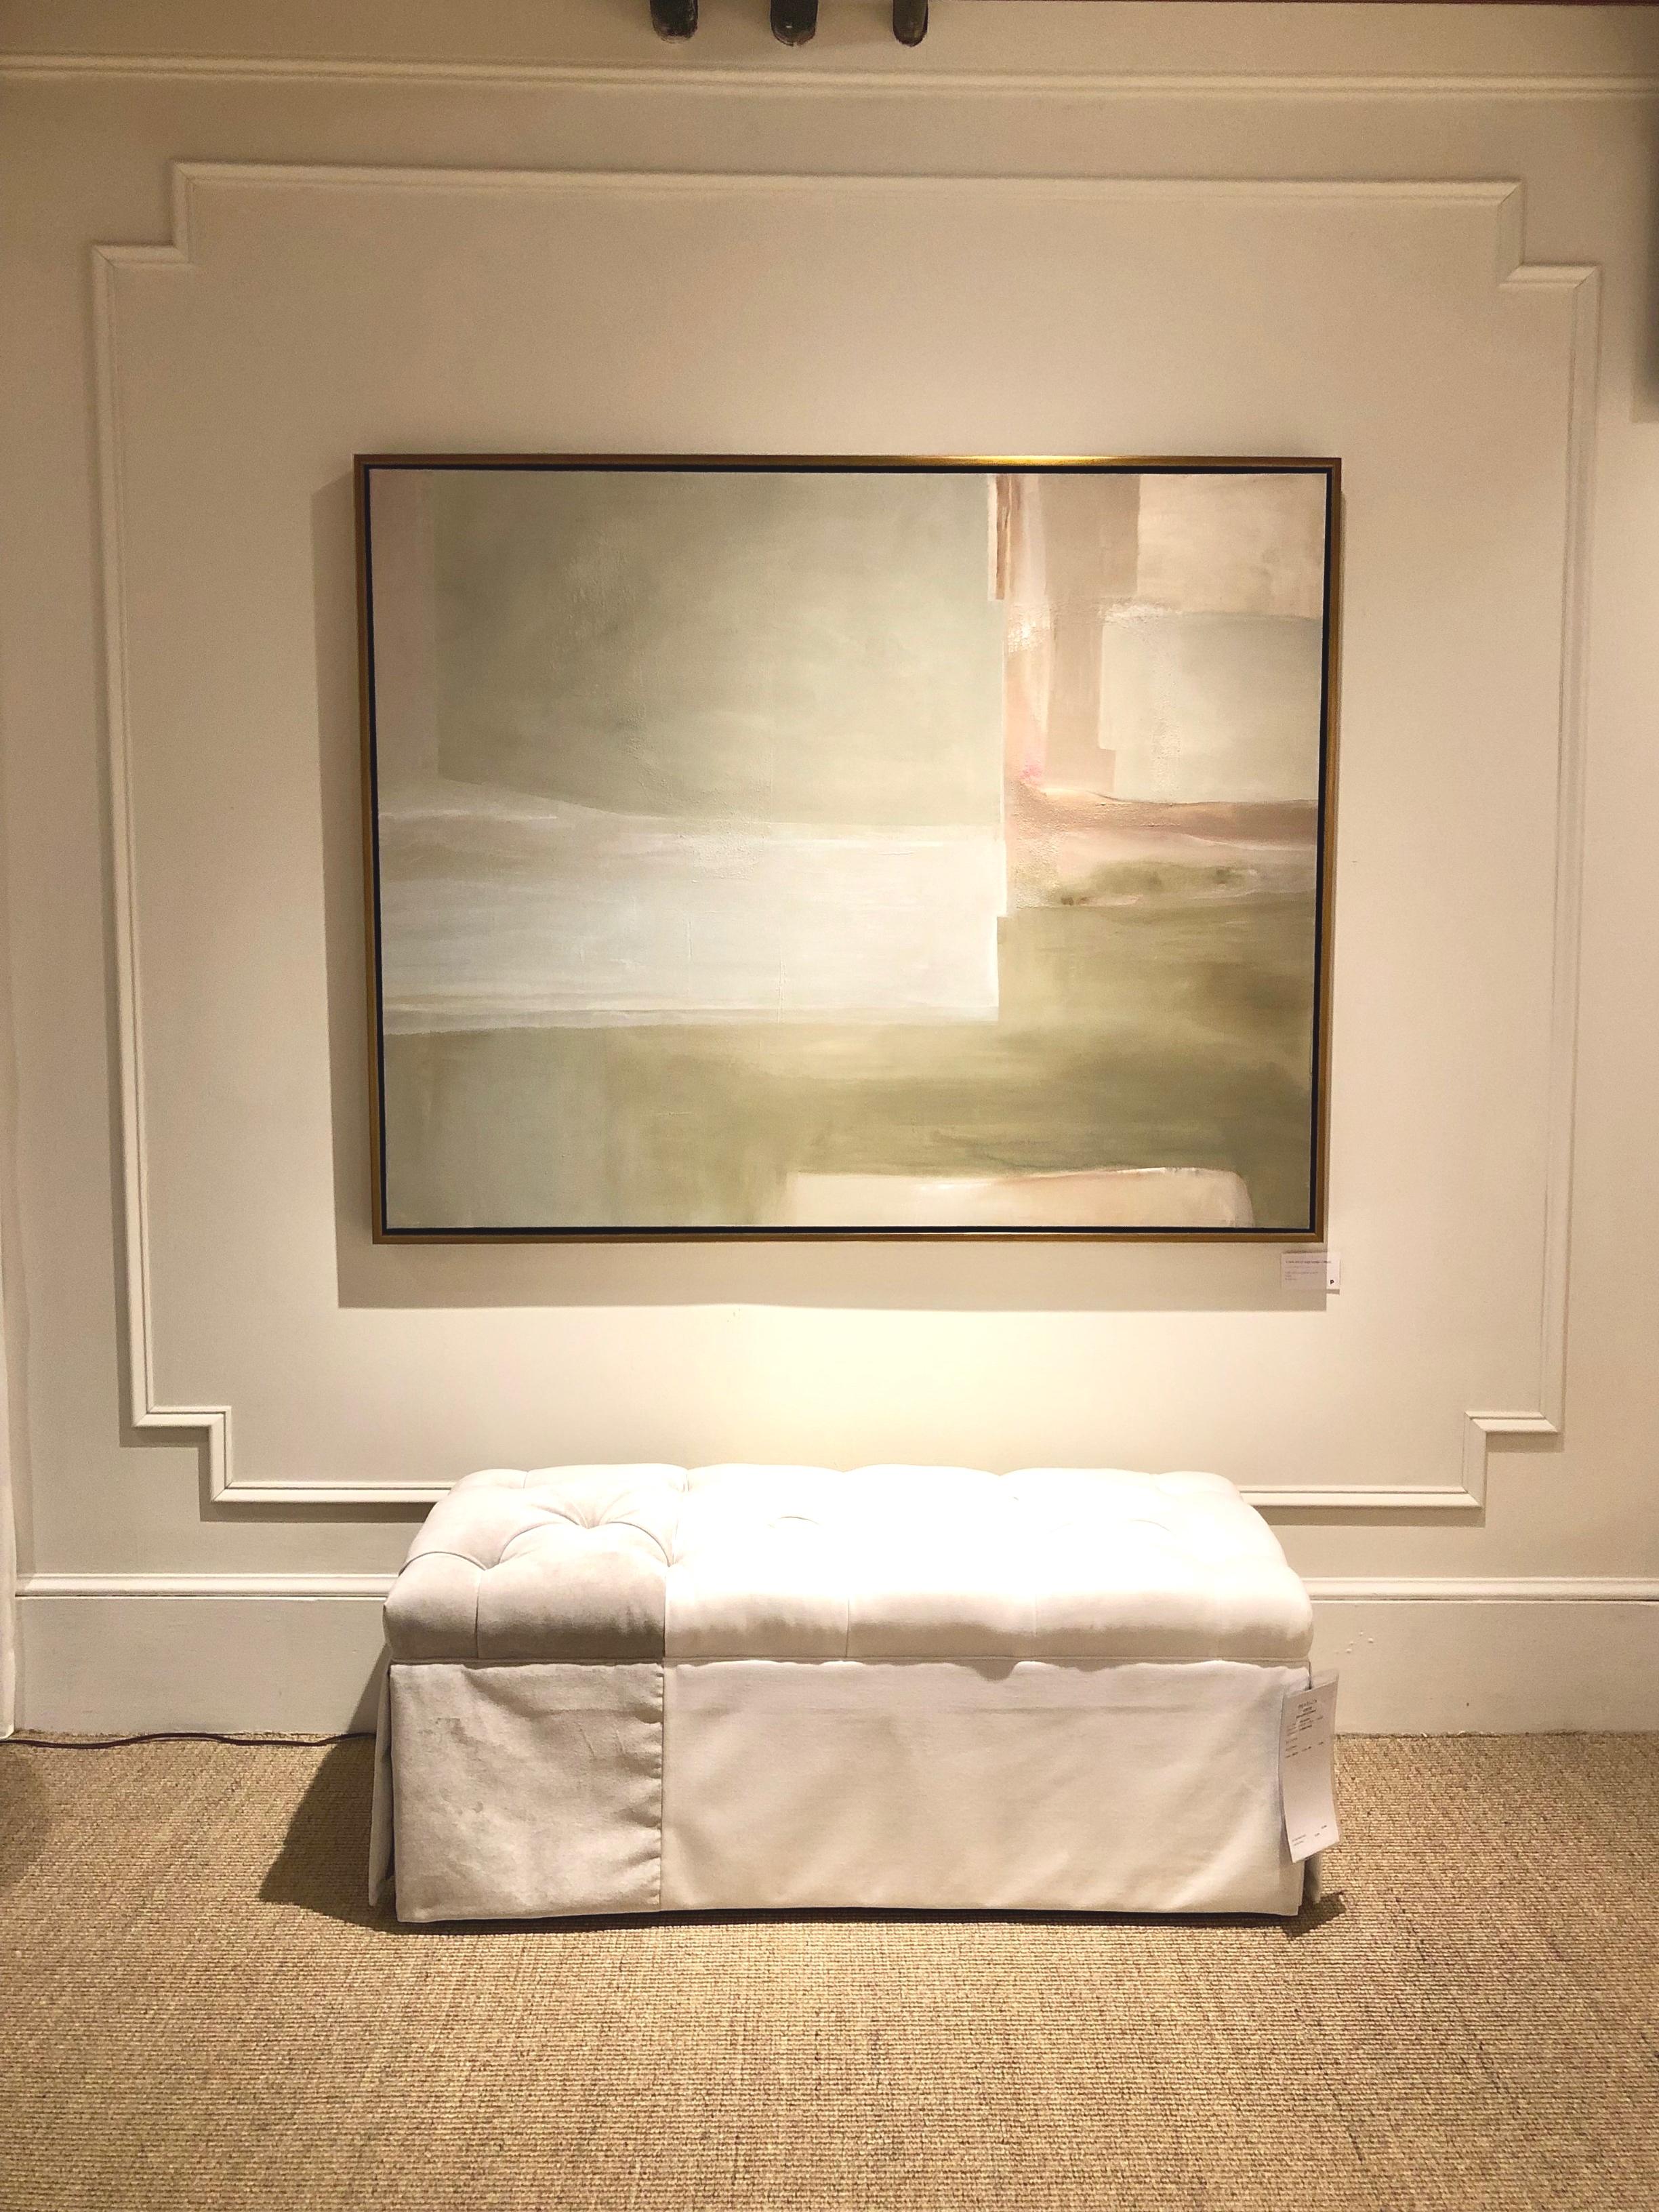 48x60, vertical or horizontal, custom framed in antique gold canvas floater frame, $3200